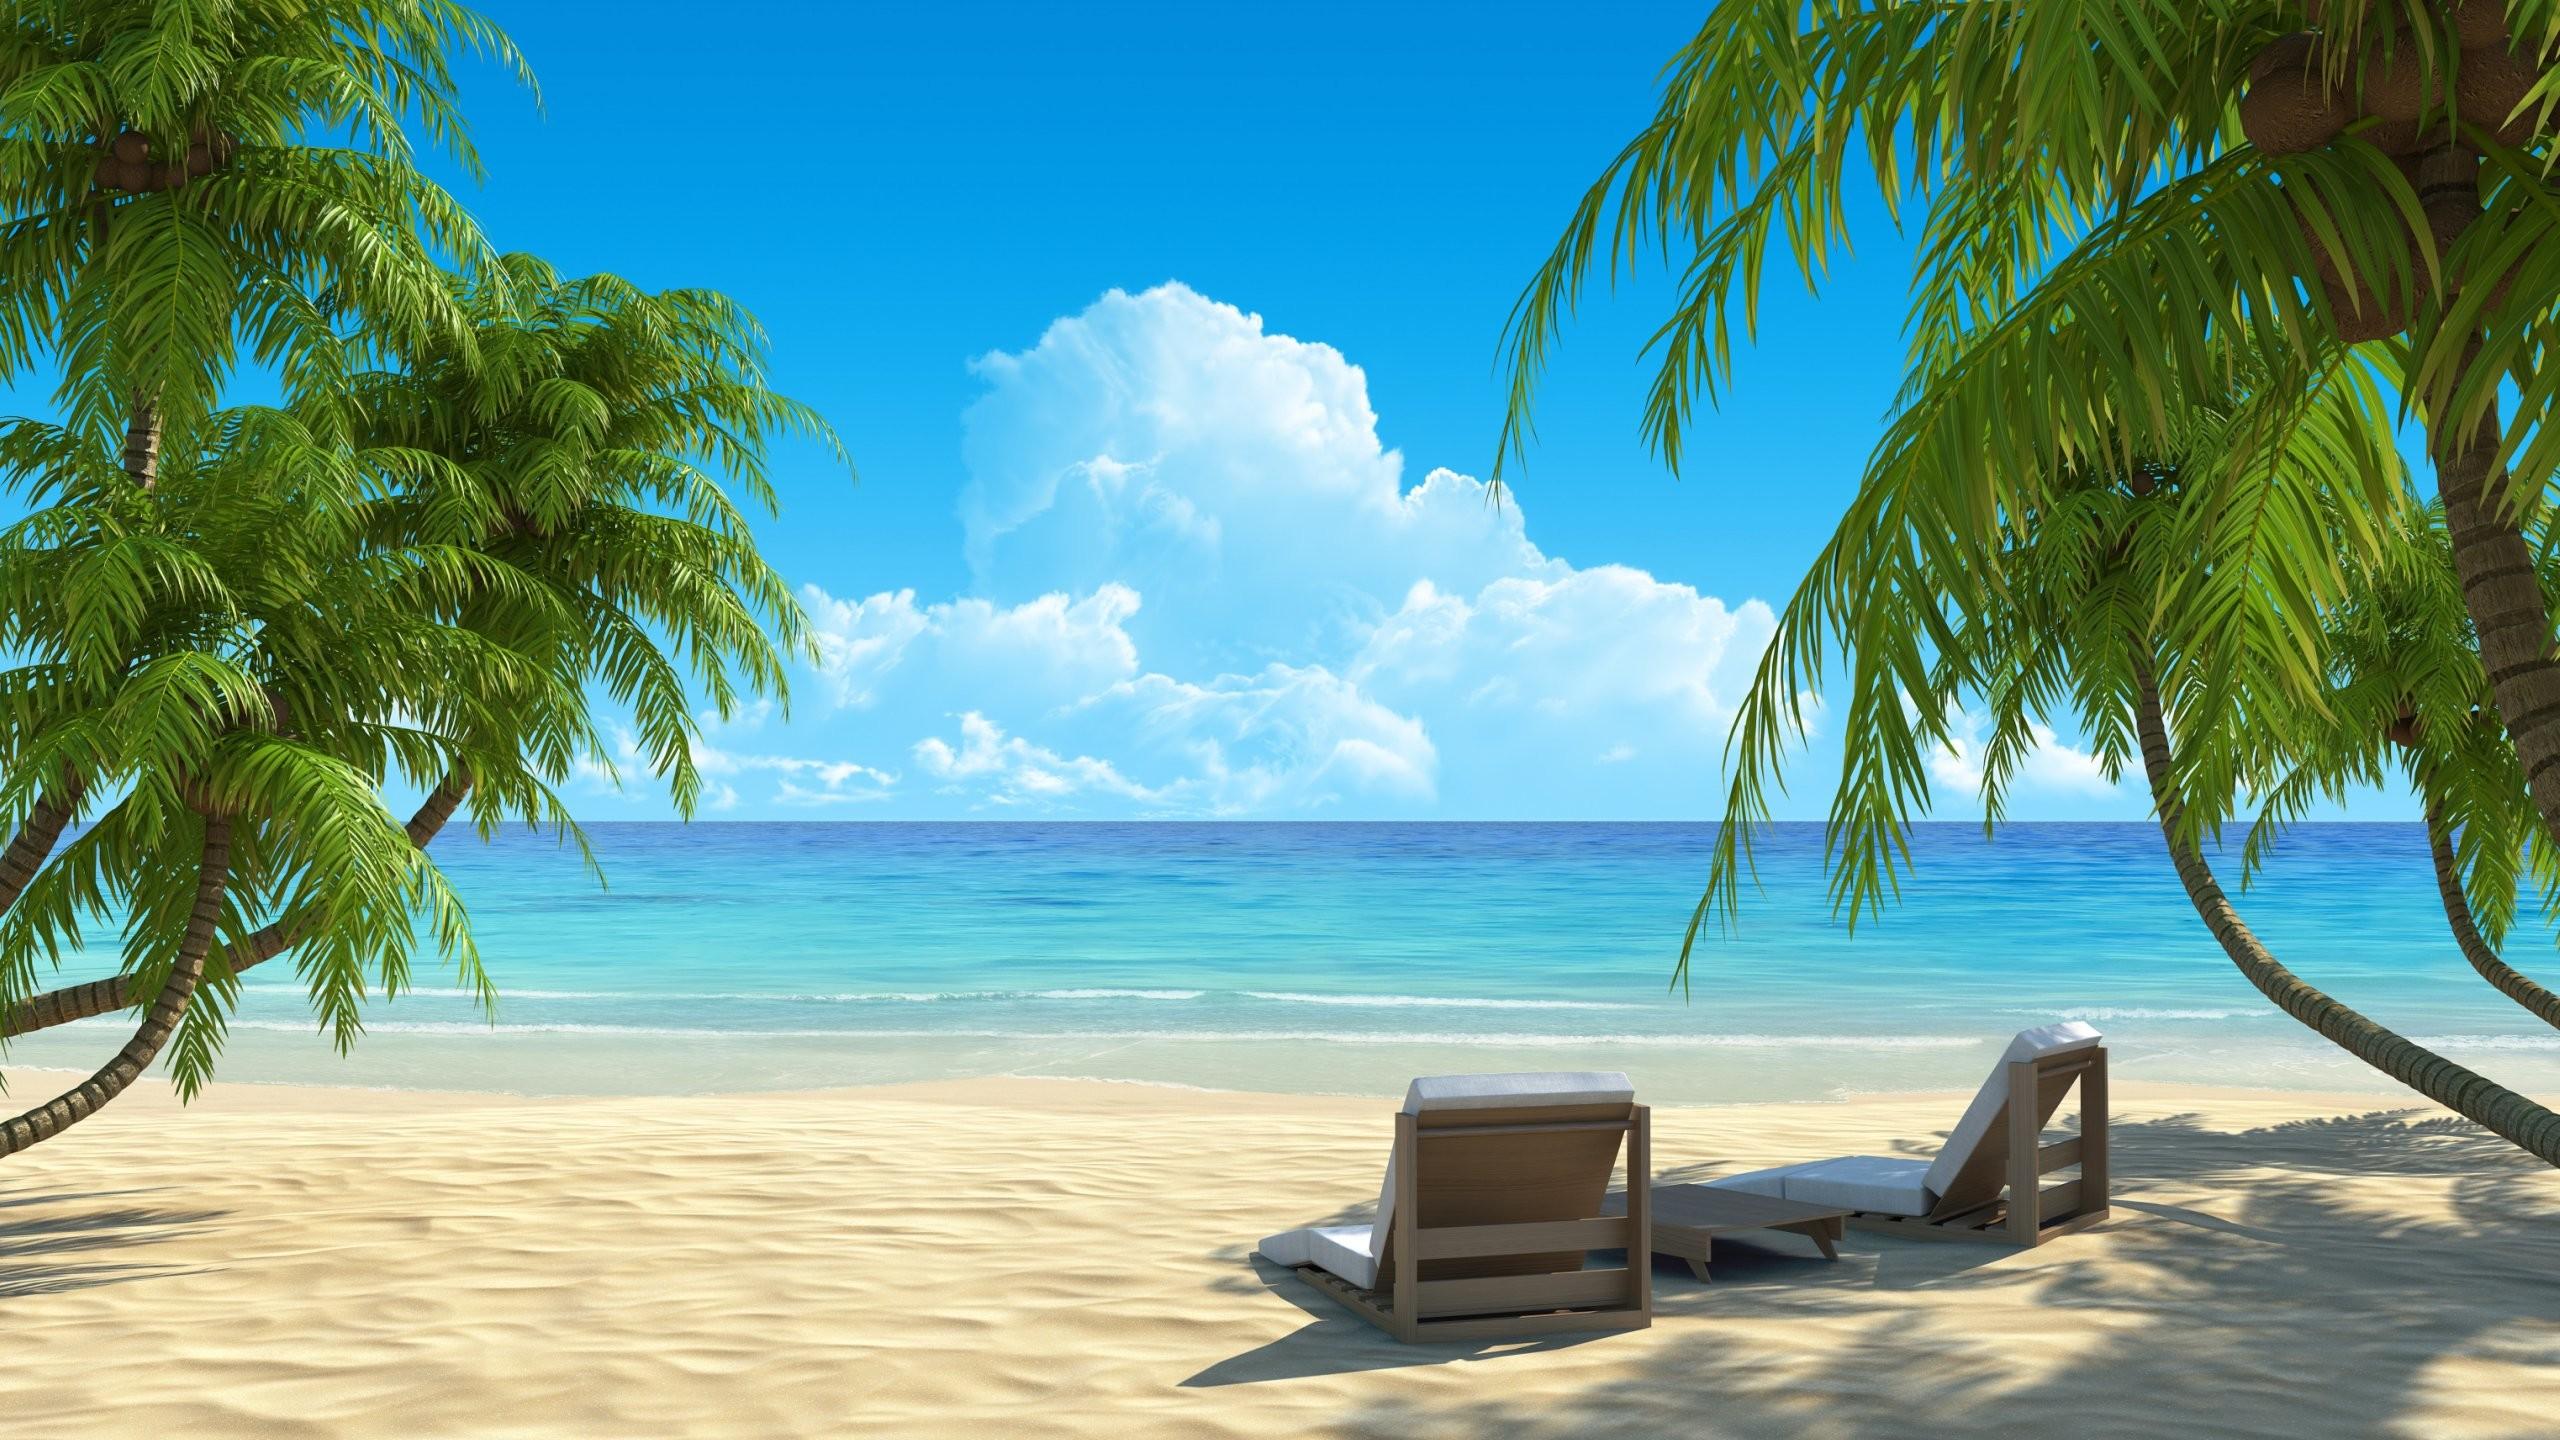 Beach Chair Wallpaper: Beach Chair Wallpaper ·① WallpaperTag